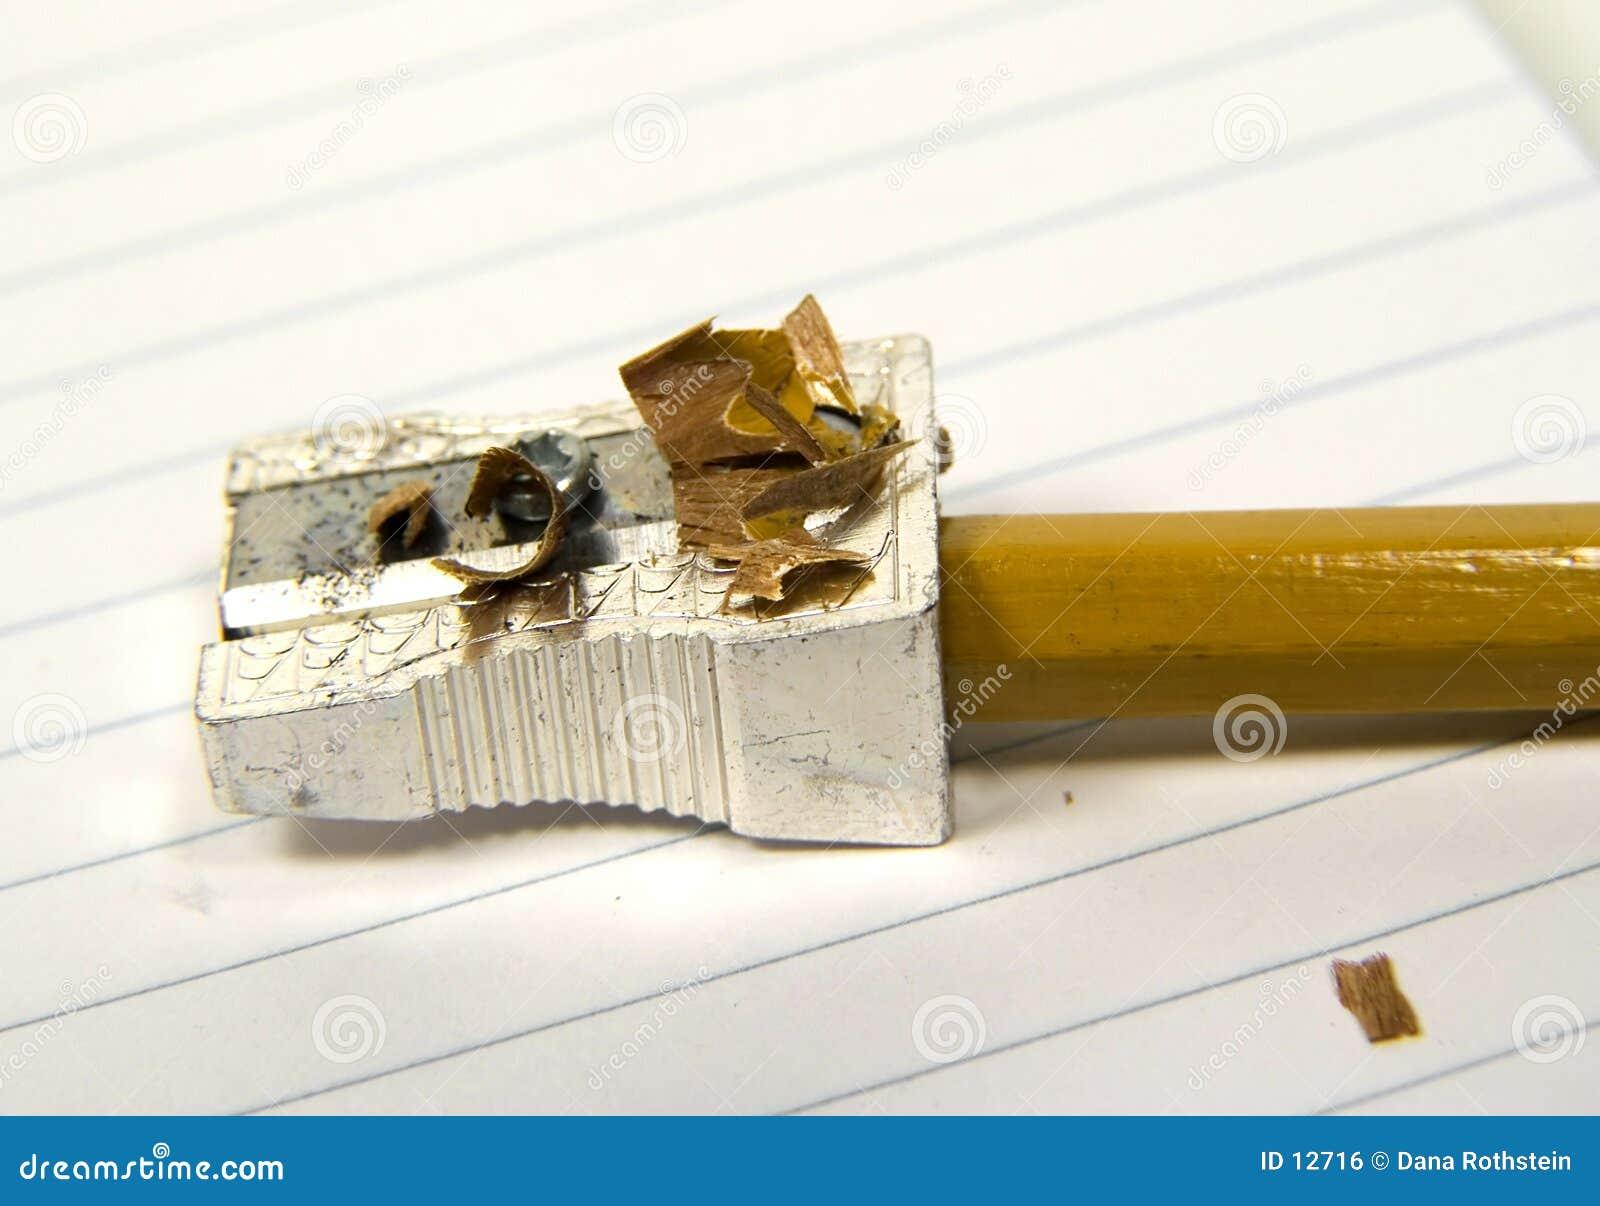 Pencil Sharpened 2